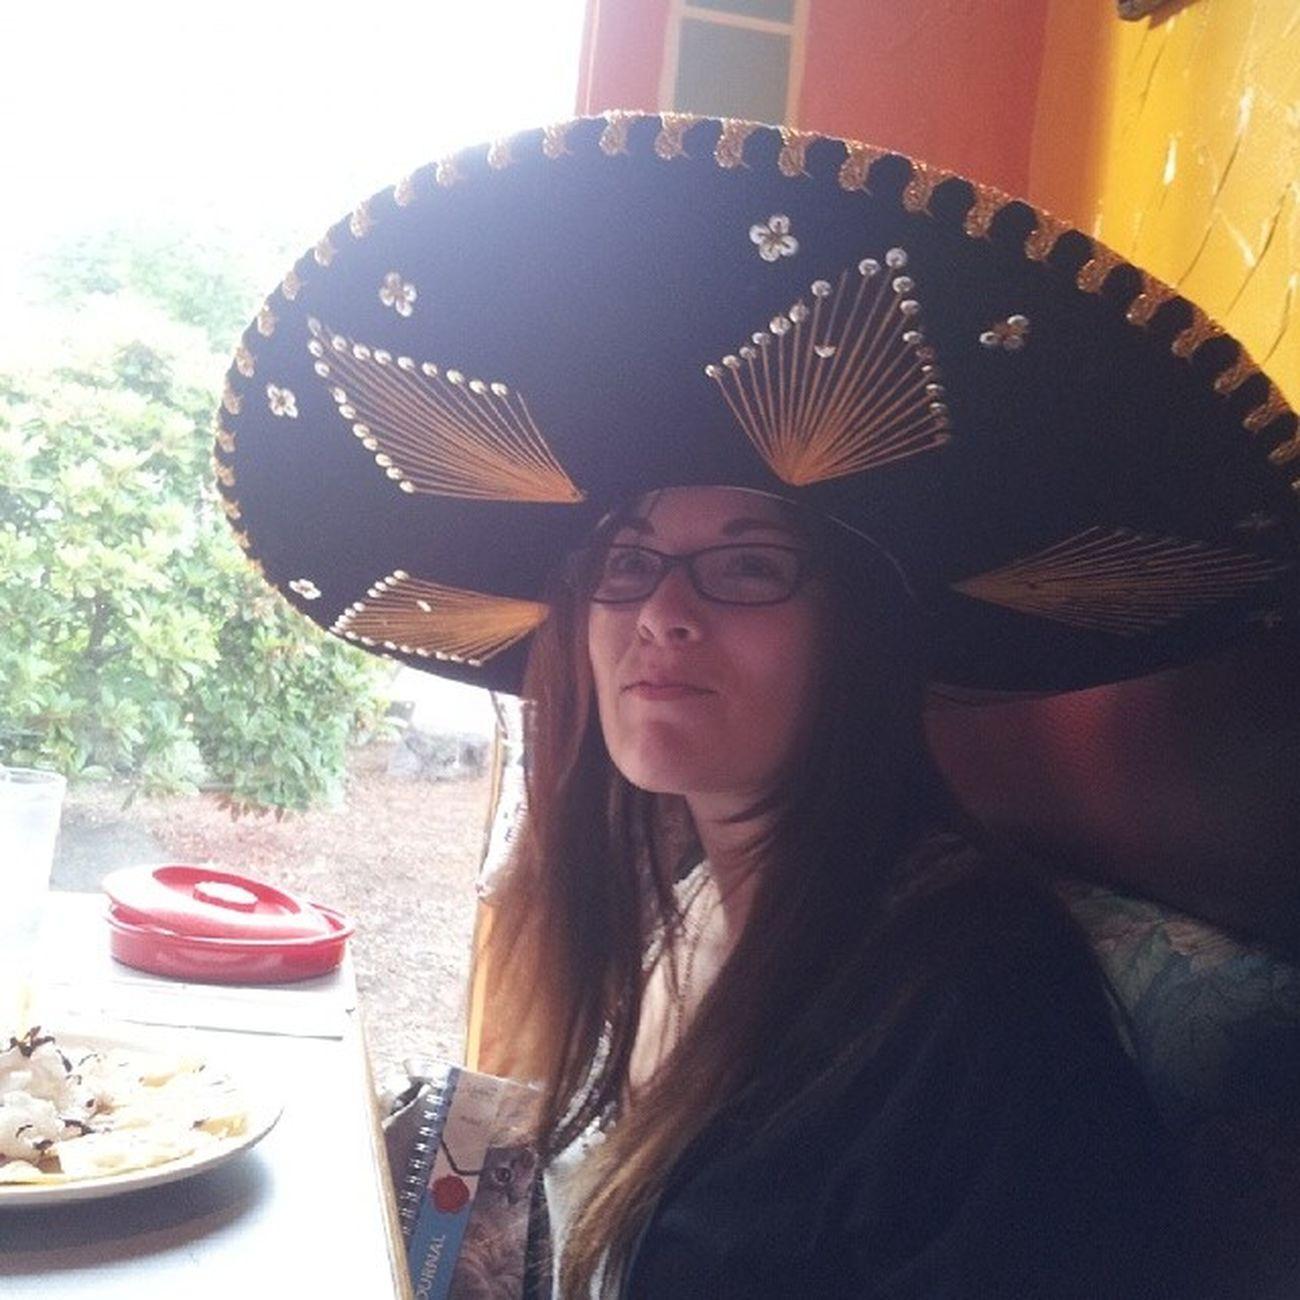 BirthdaySombrero for the noodle.. Happy17 Happybday HappyBirthday loveyou instagrammy instagood instafame